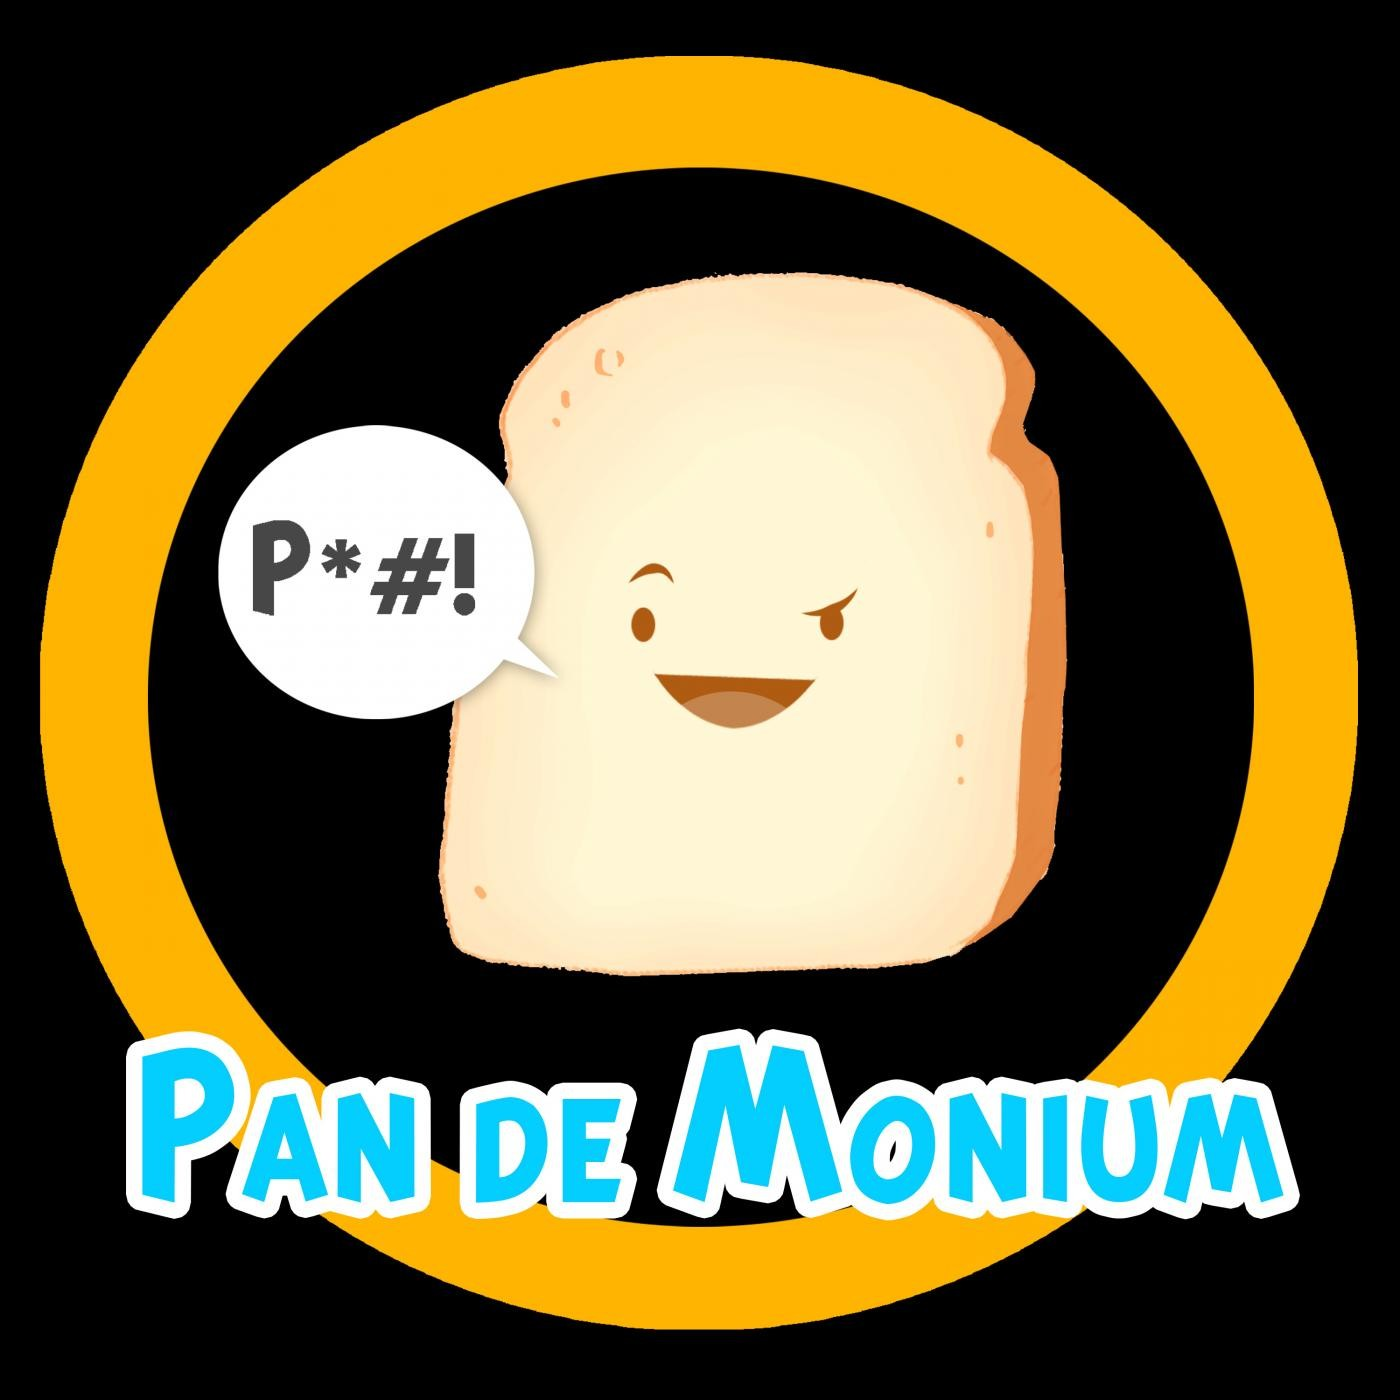 <![CDATA[Pan de Monium]]>